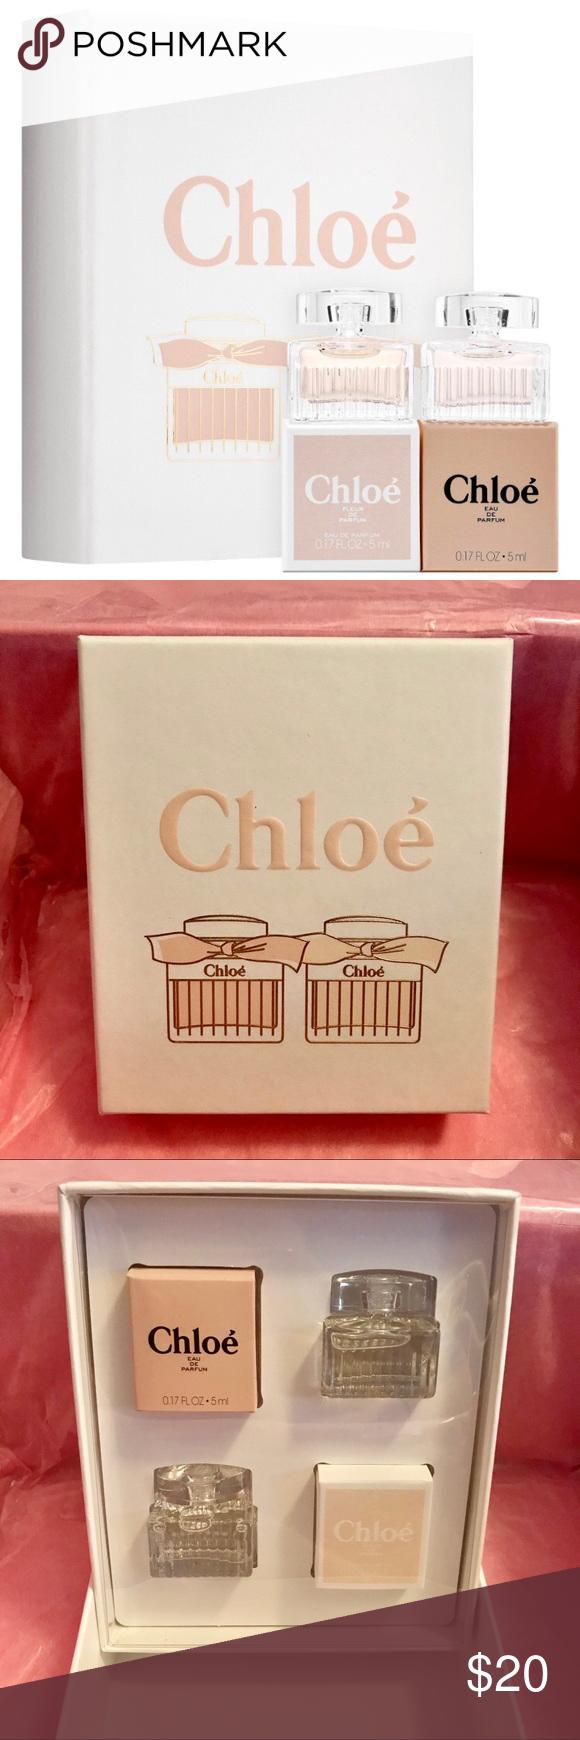 Chloe Deluxe Nude Photos 85